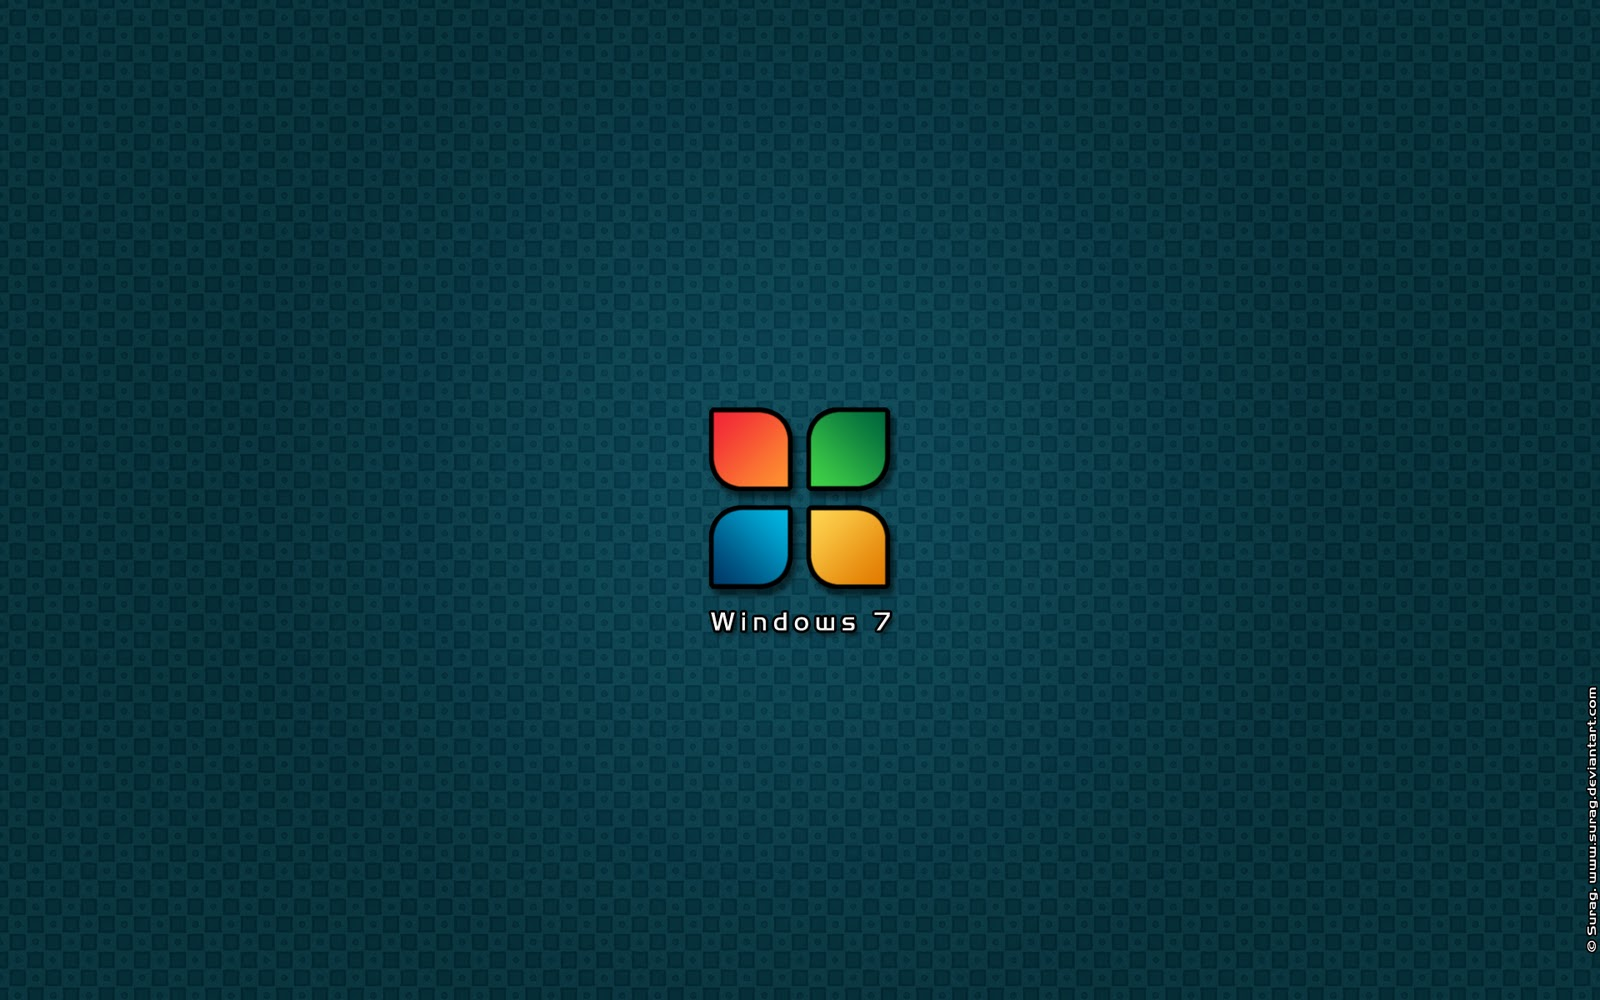 http://2.bp.blogspot.com/_Kpi0thIqeJI/TSmJSQgOjaI/AAAAAAAABrQ/jy6yQBR2r2k/s1600/logo---windows-7-wallpapers_18179_1920x1200.jpg